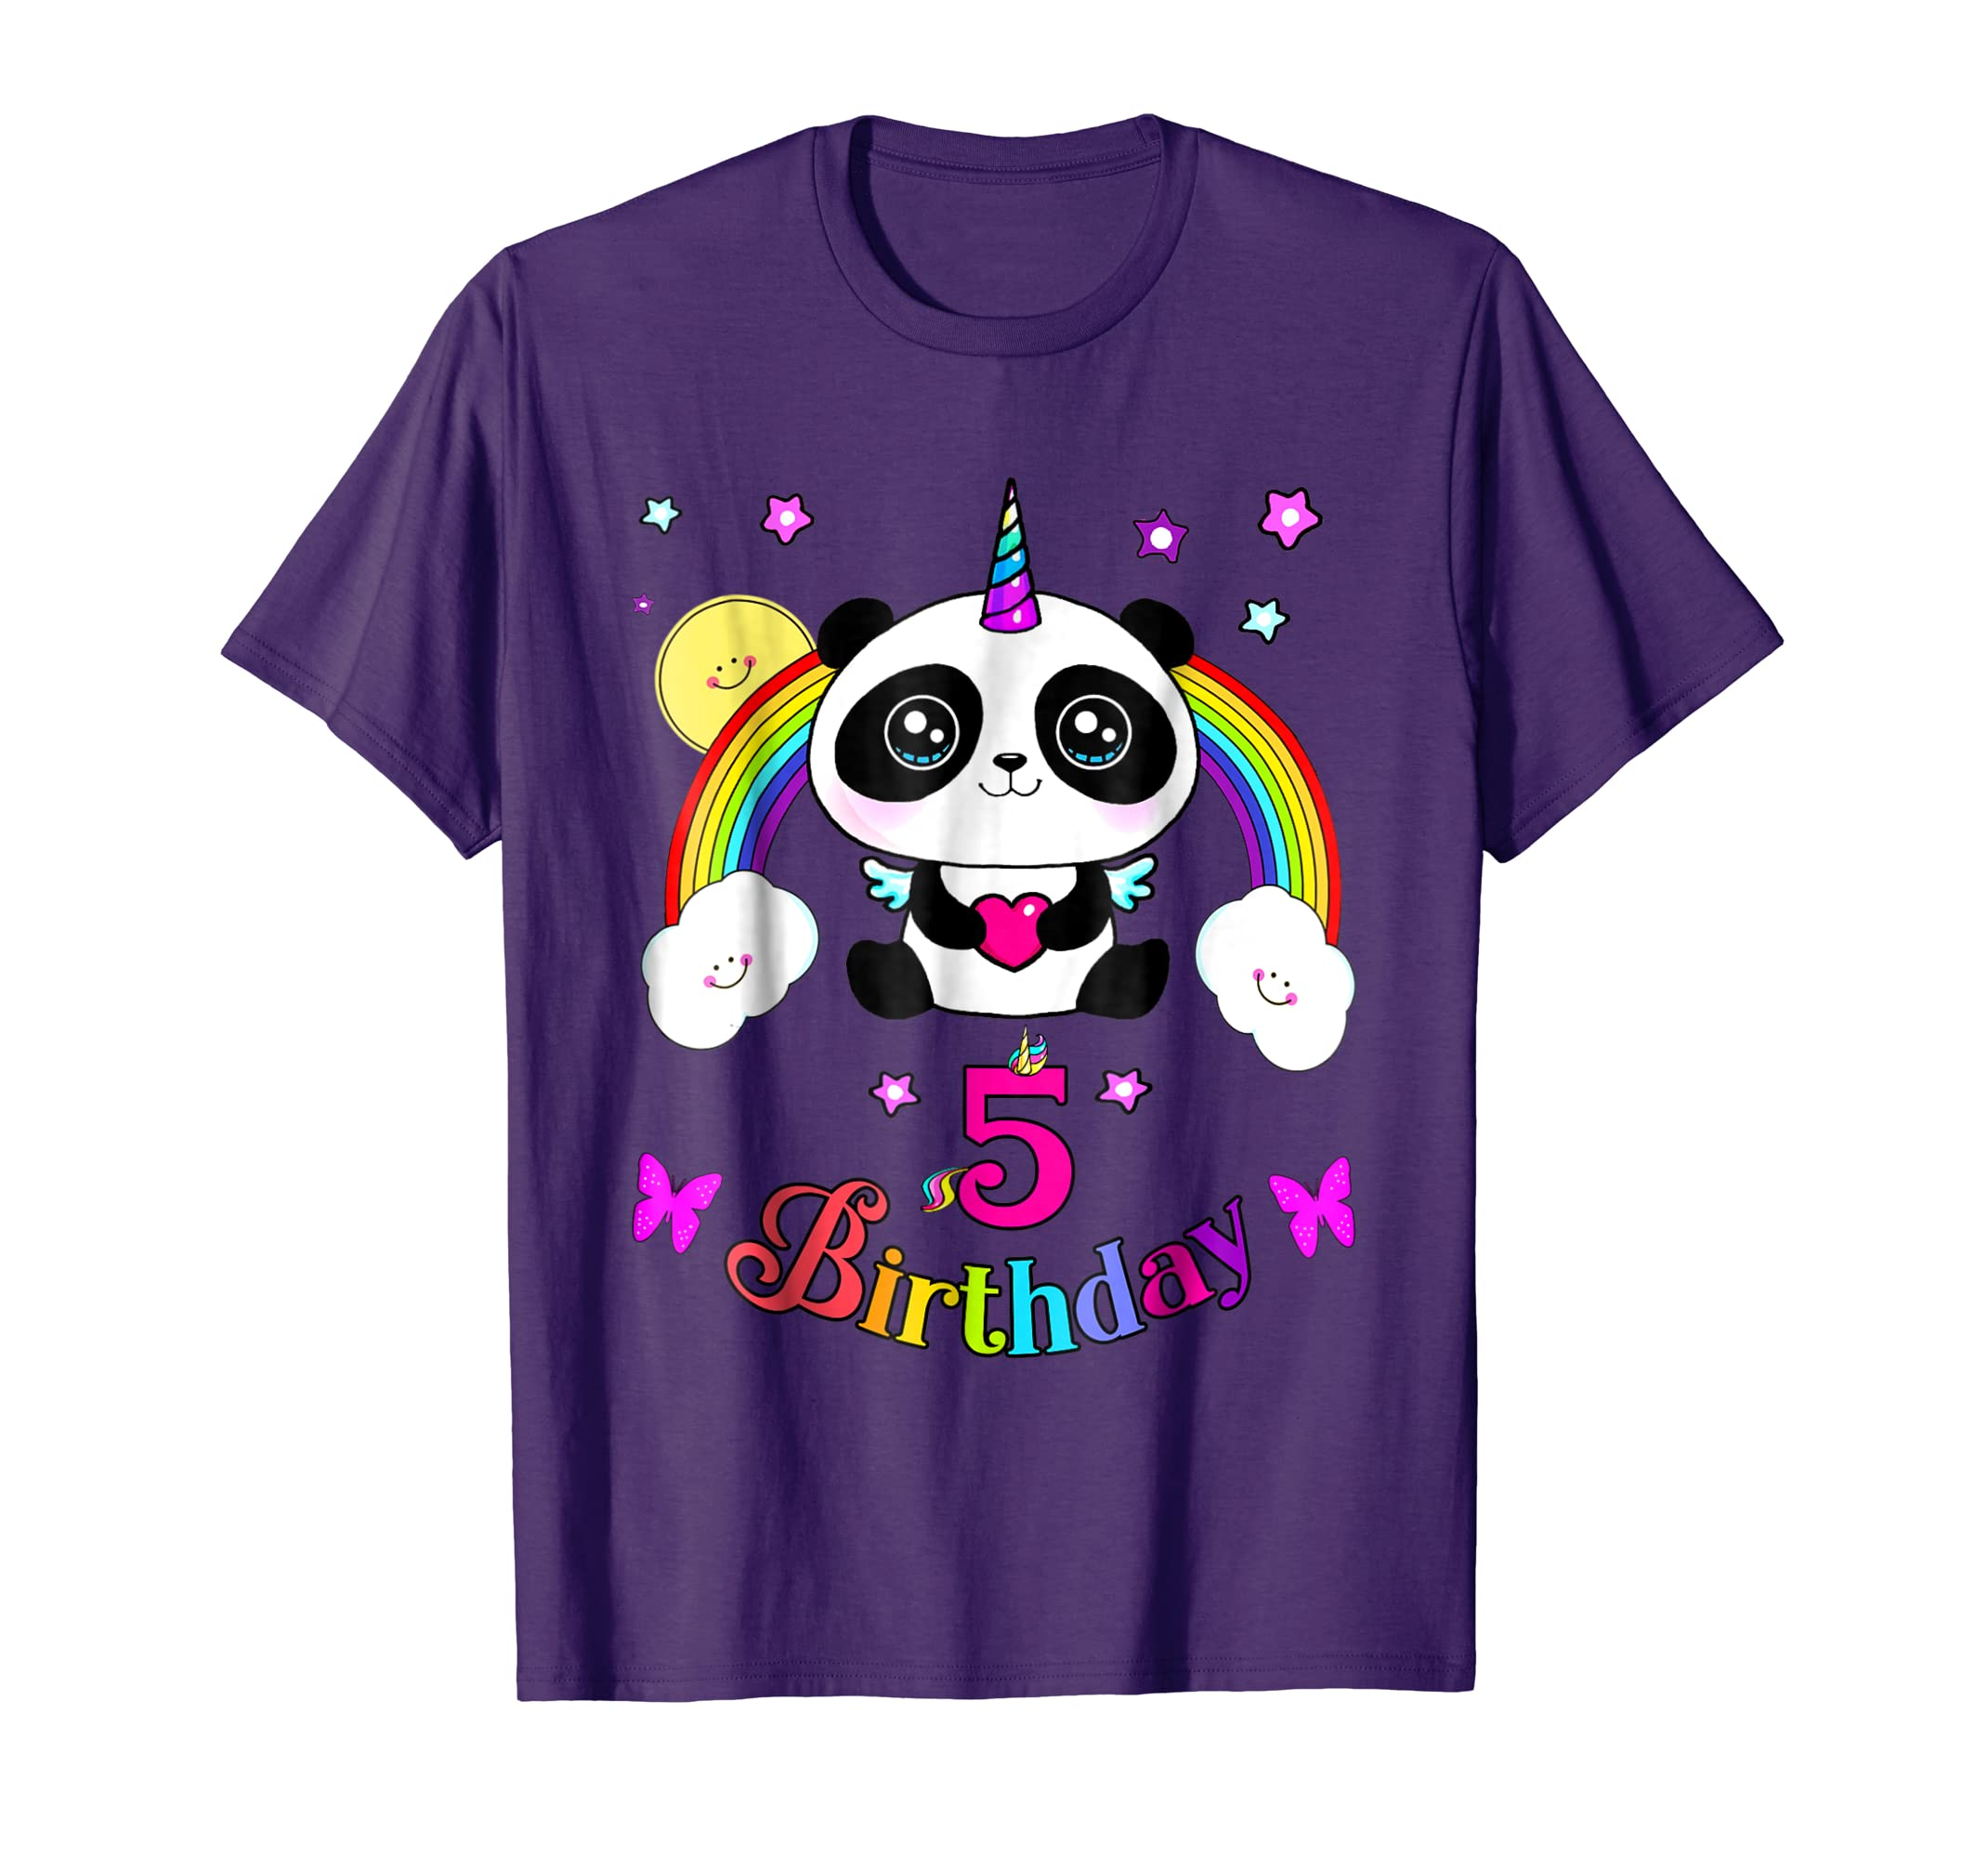 Amazon.com: 5th Birthday Cute Panda T-Shirt best 5 Years old ...